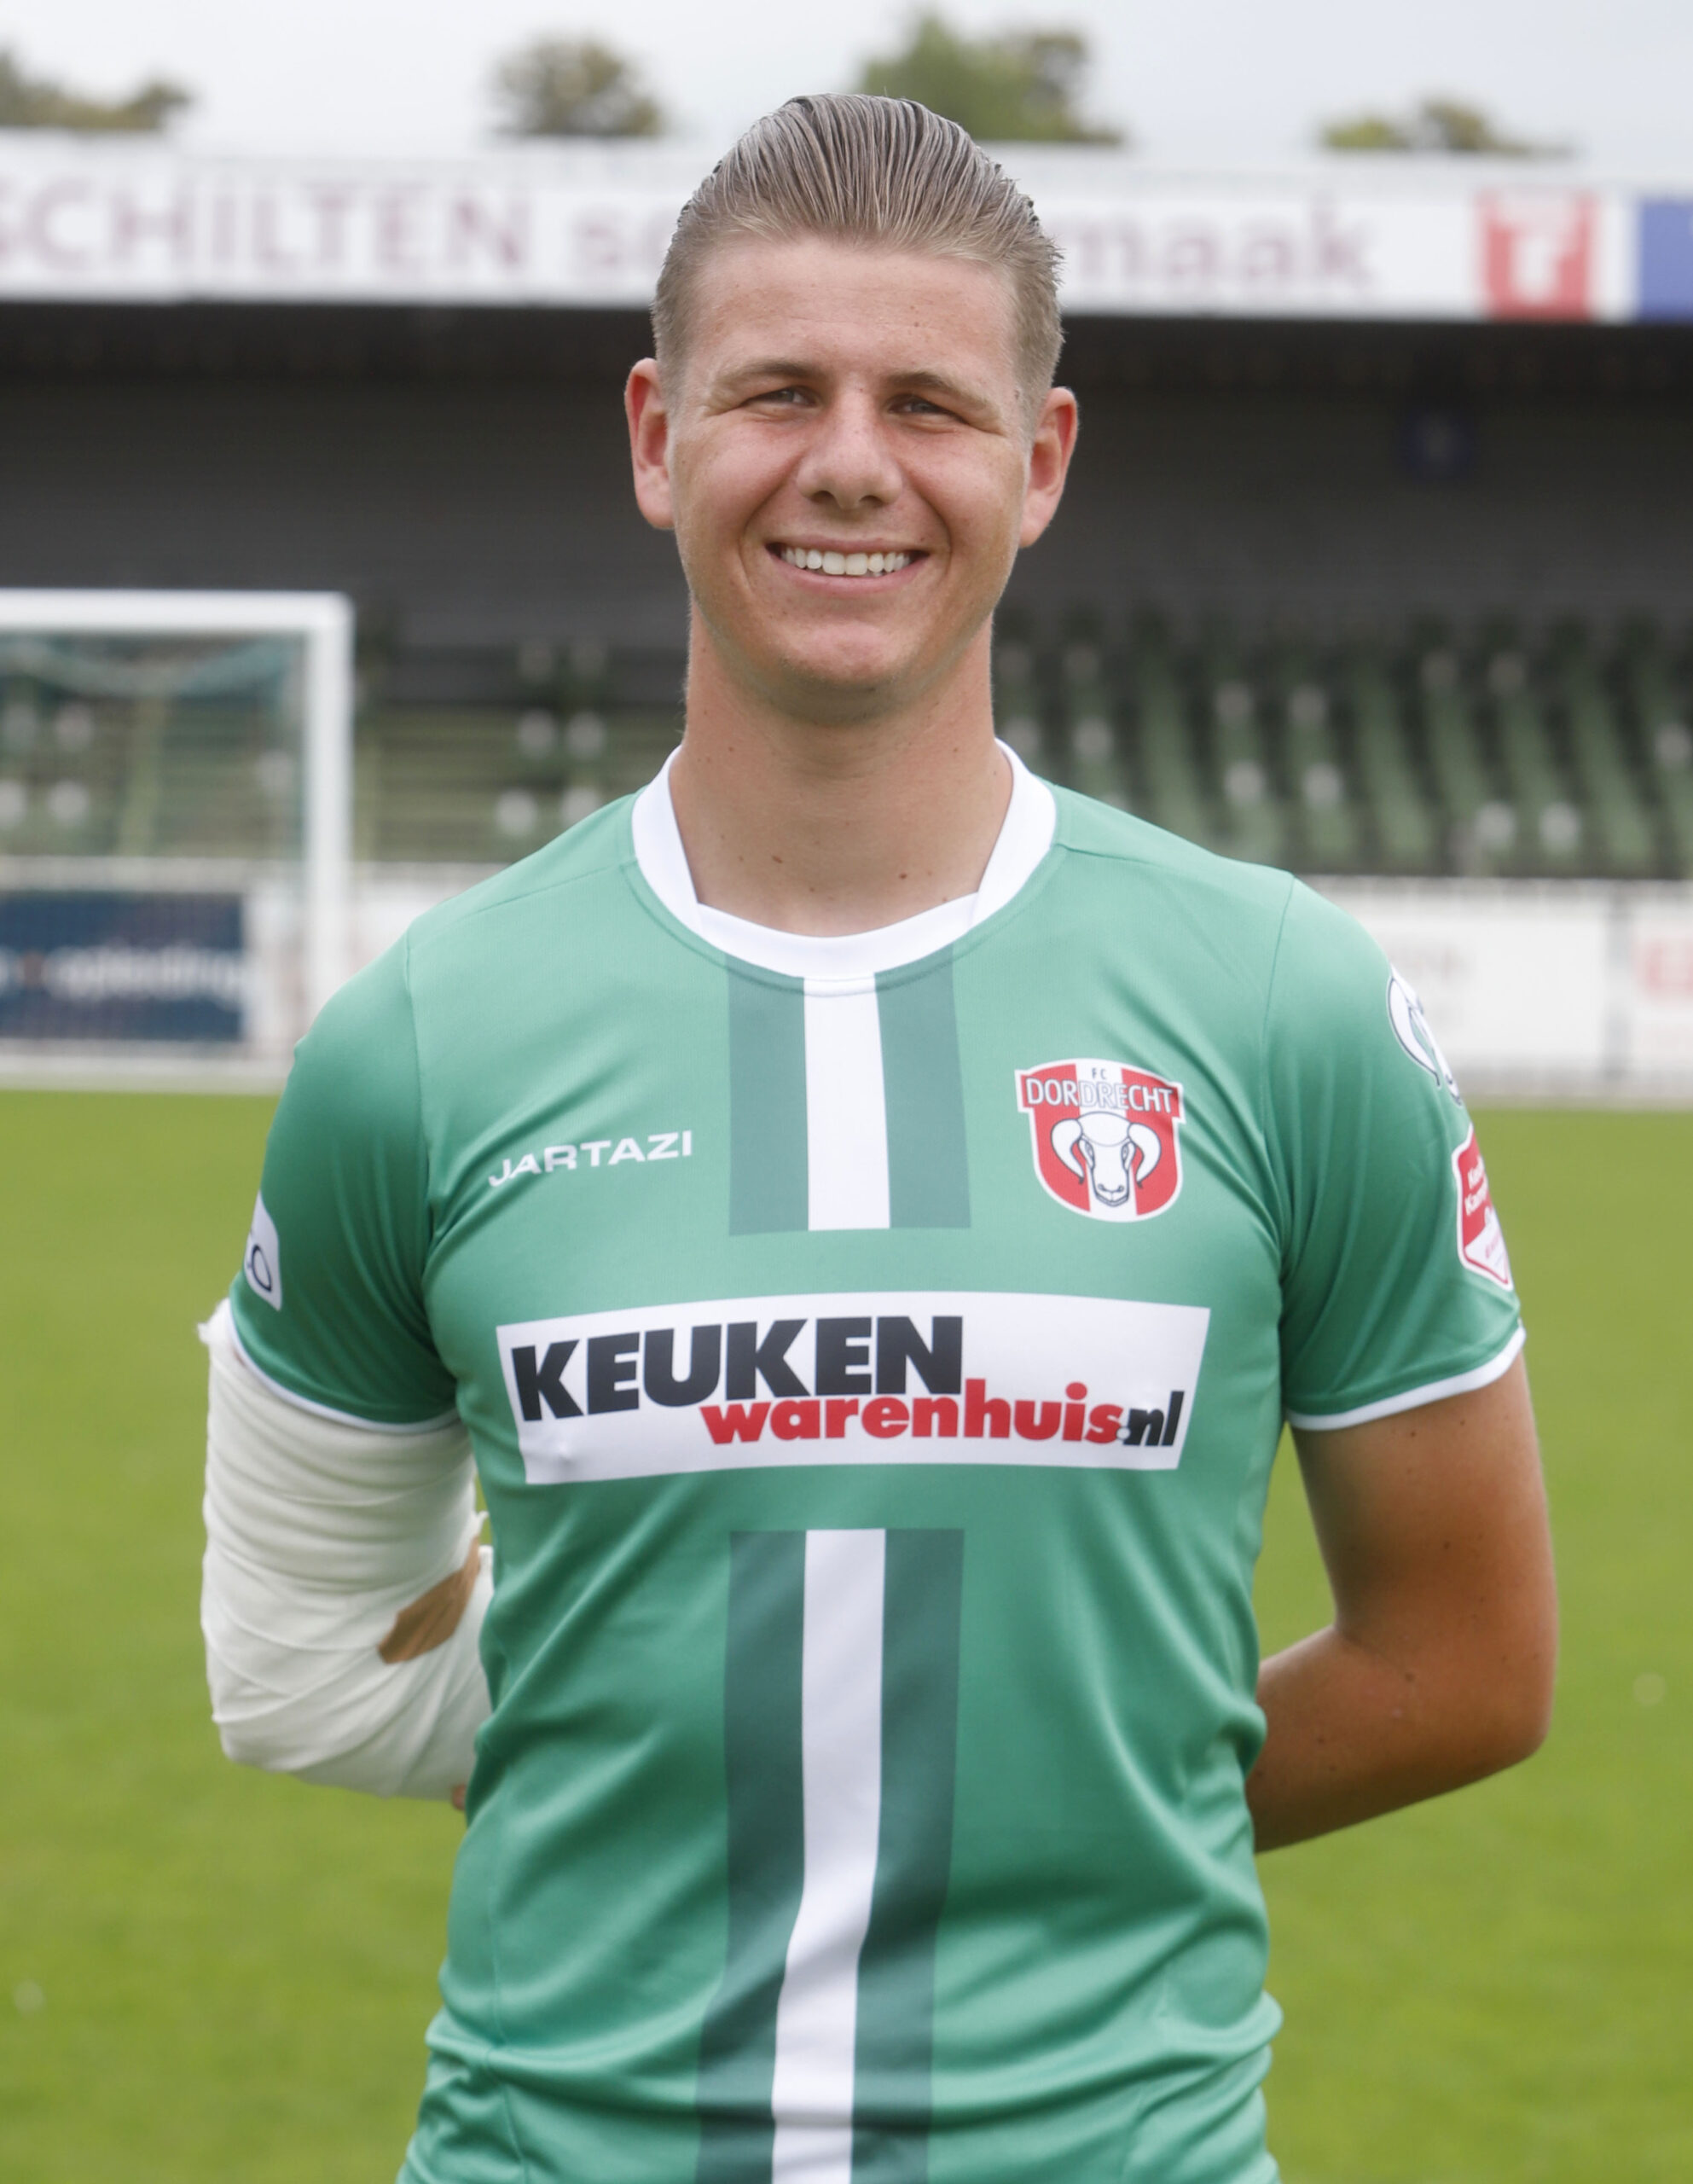 Thomas Schalekamp